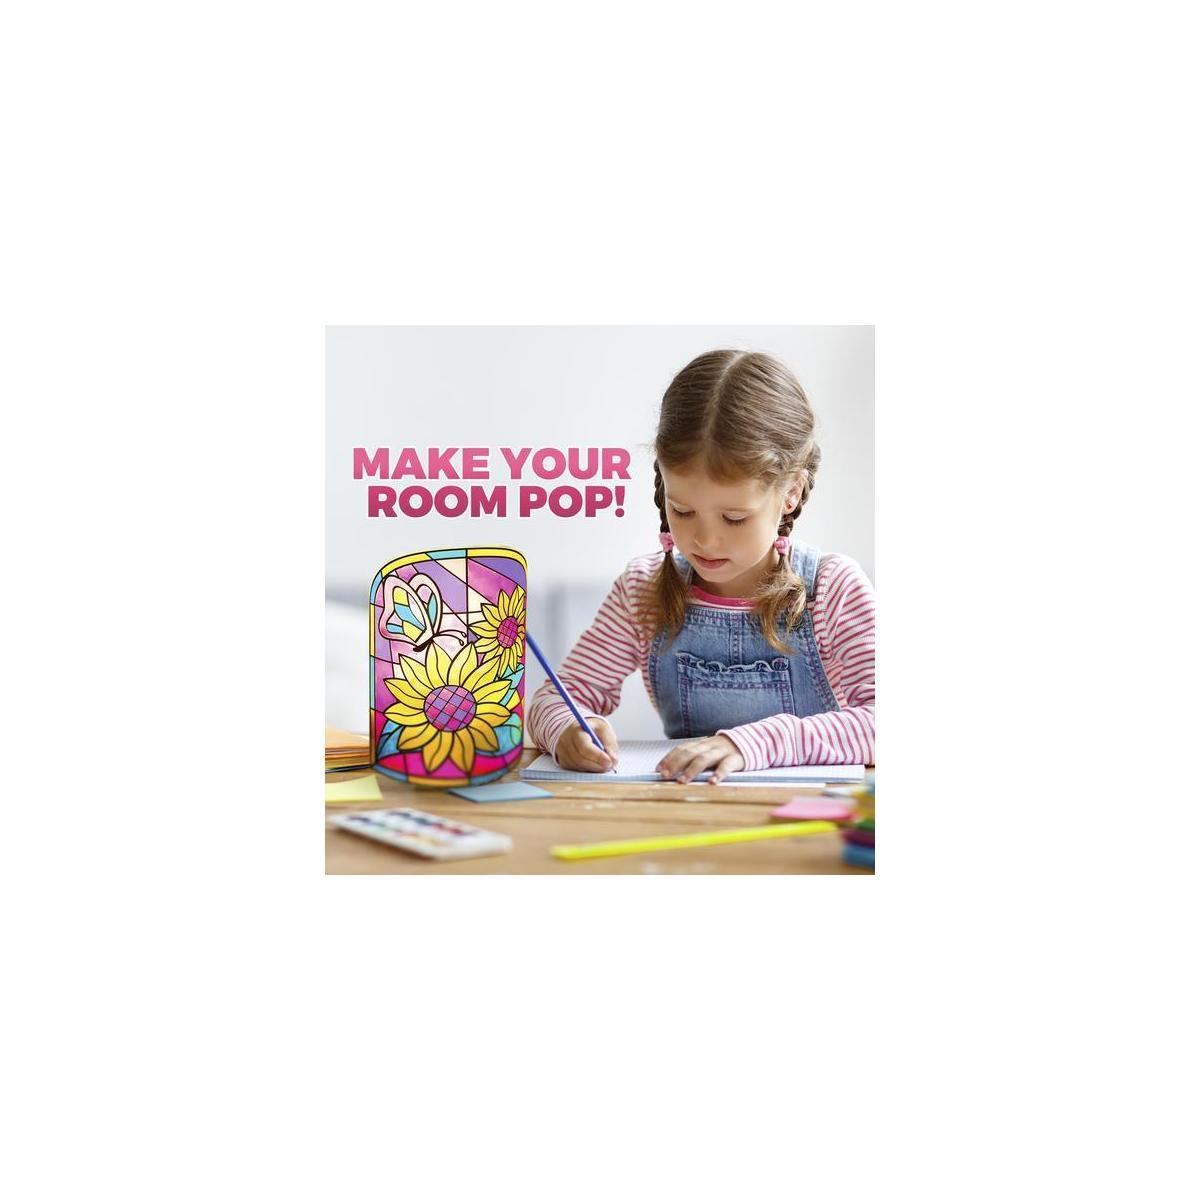 LAMP DIY Kit for Kids